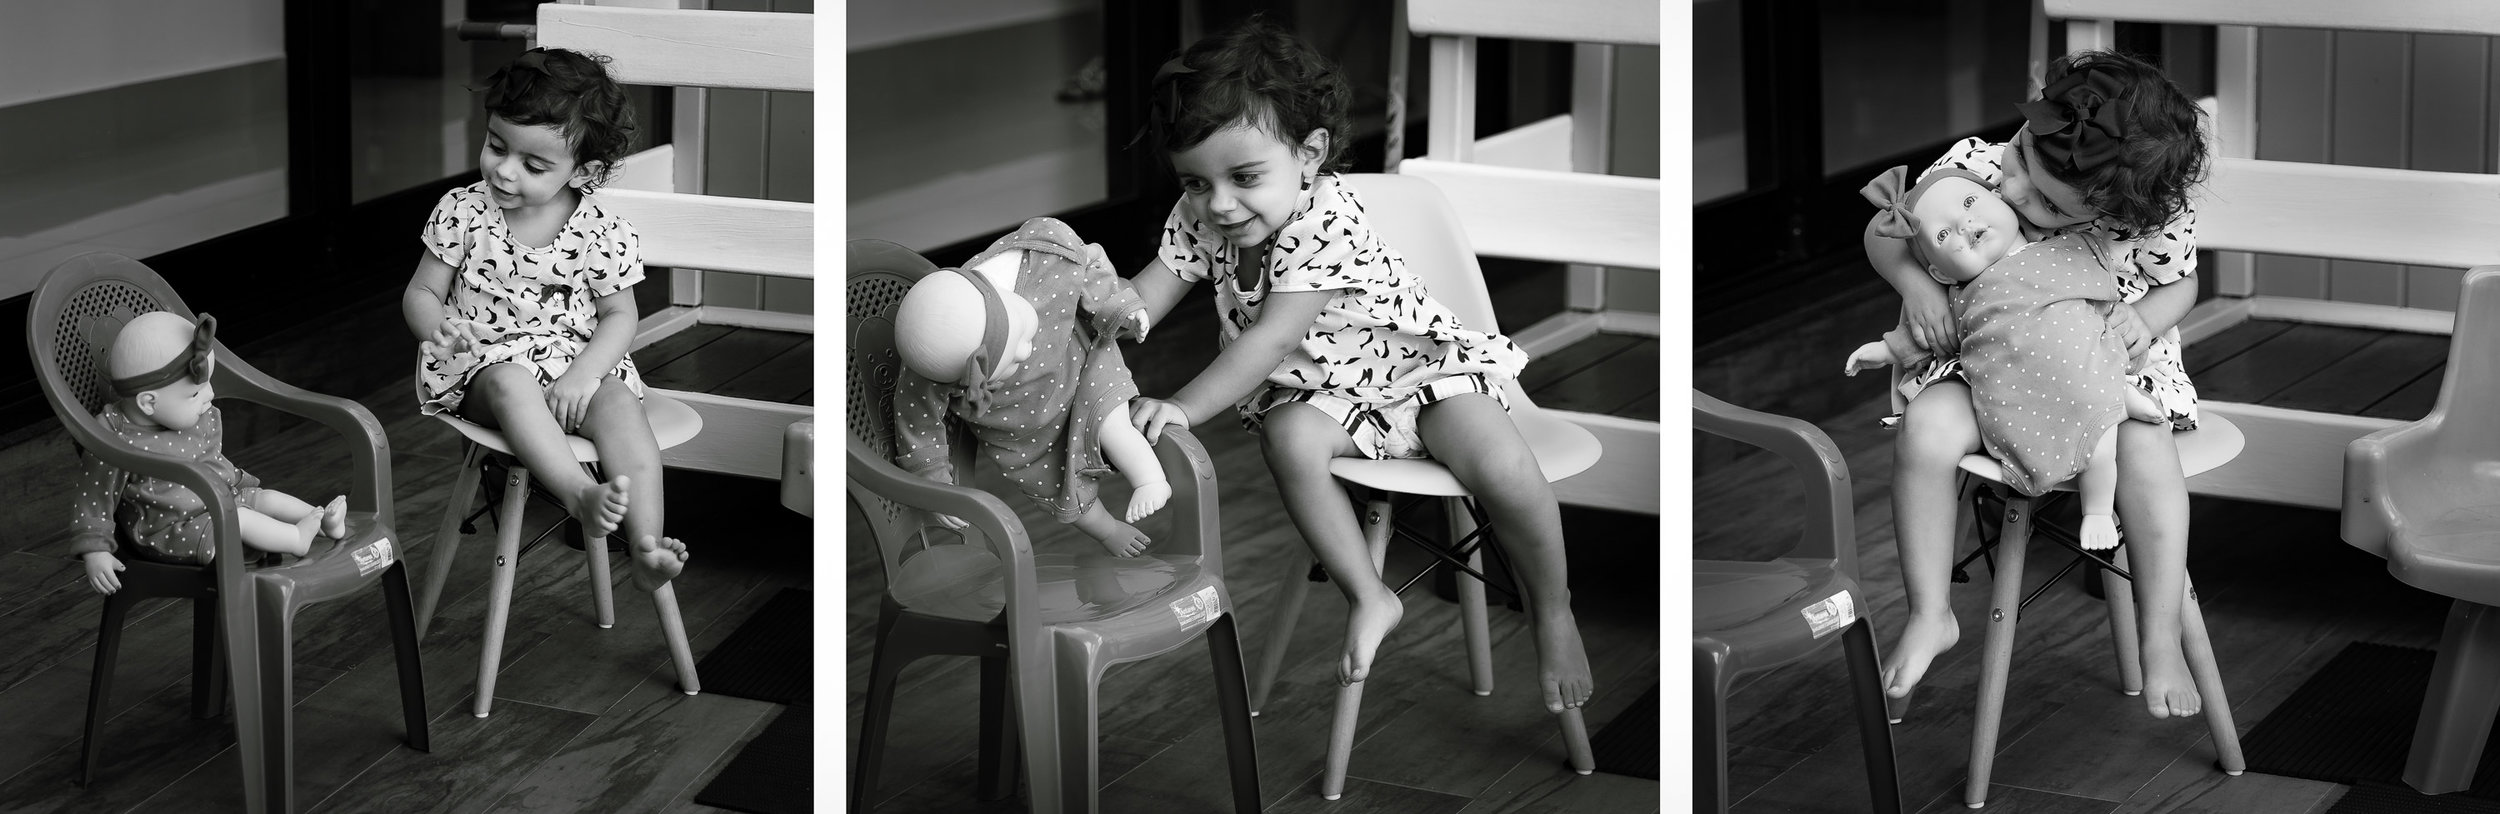 little-girl-playing-dolls.jpg